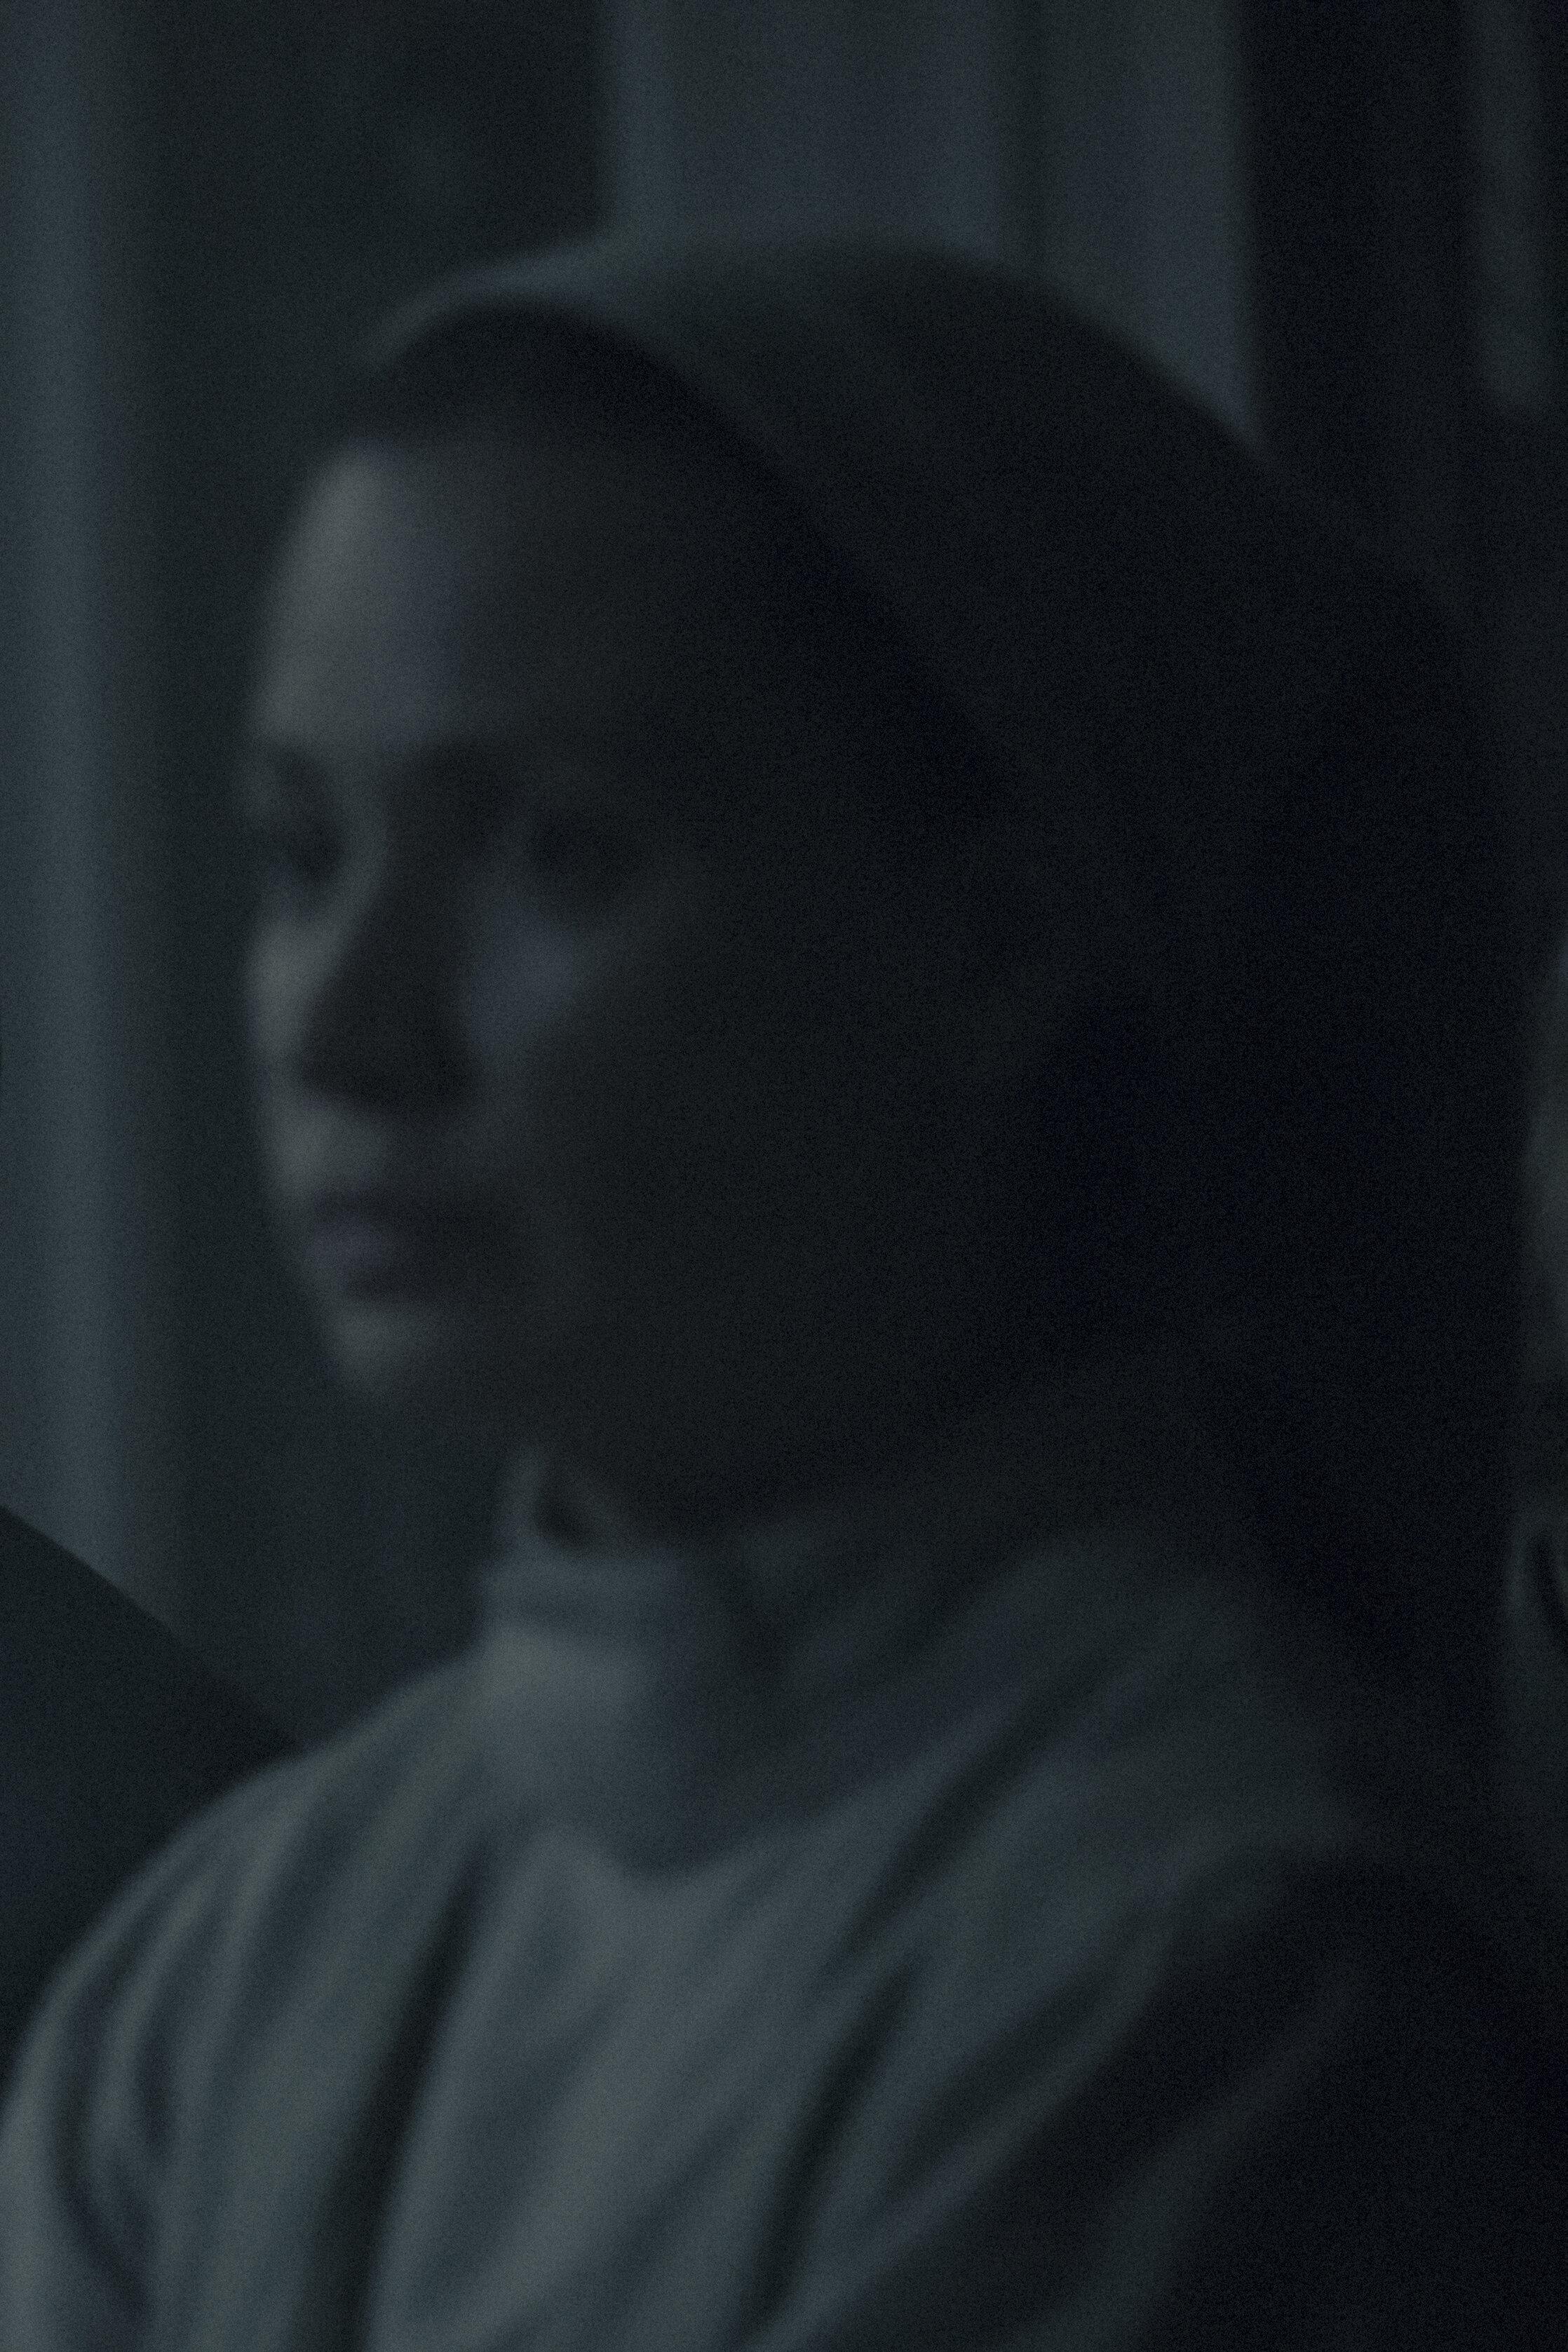 The Handmaid's Tale : La servante écarlate - Alerte